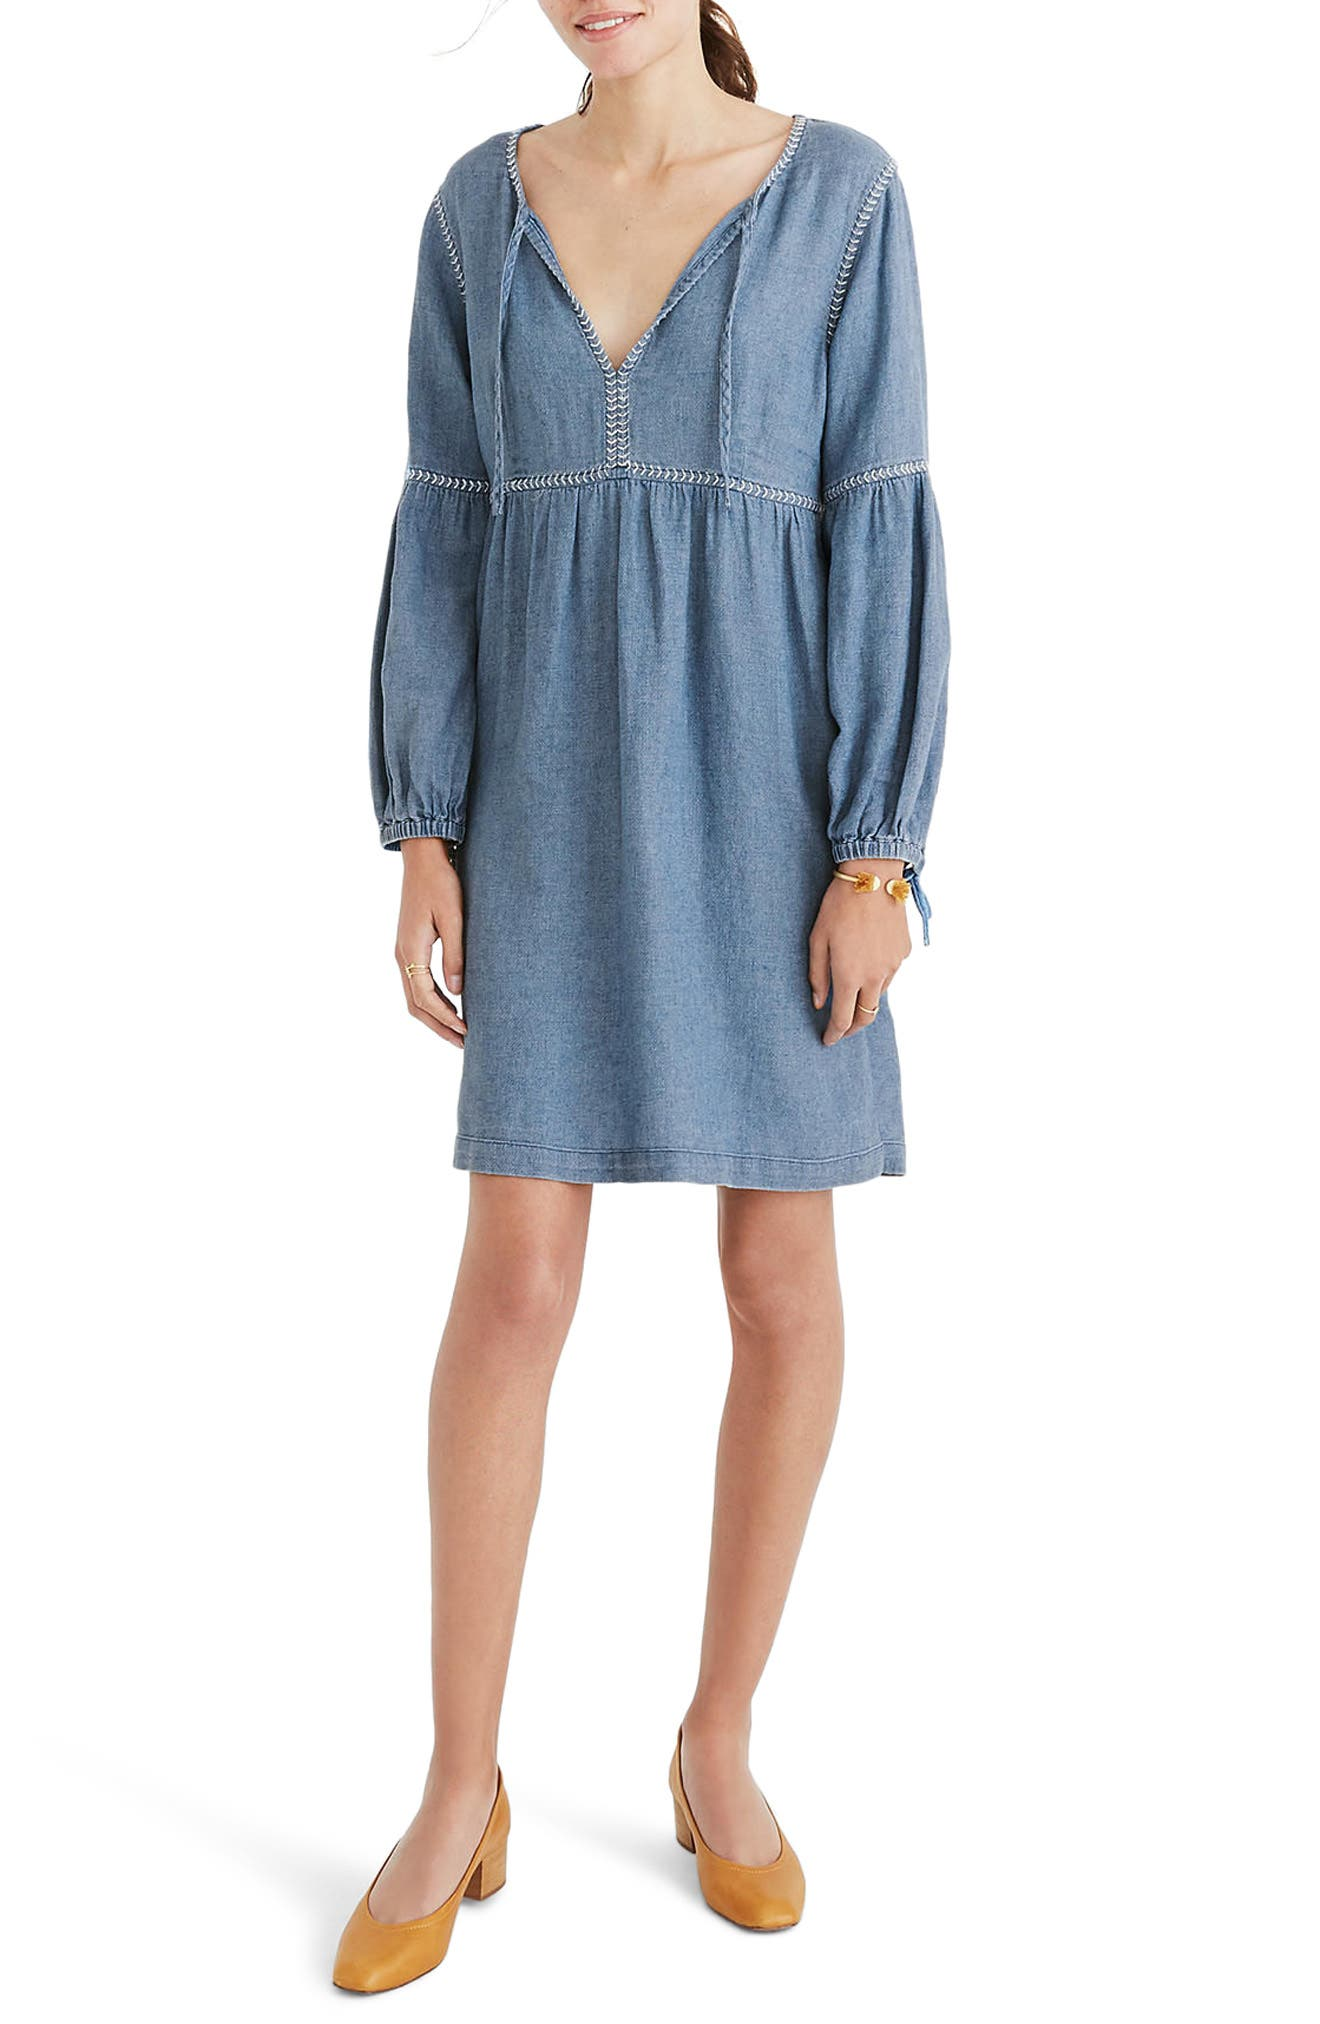 Indigo Peasant Dress,                         Main,                         color, 400